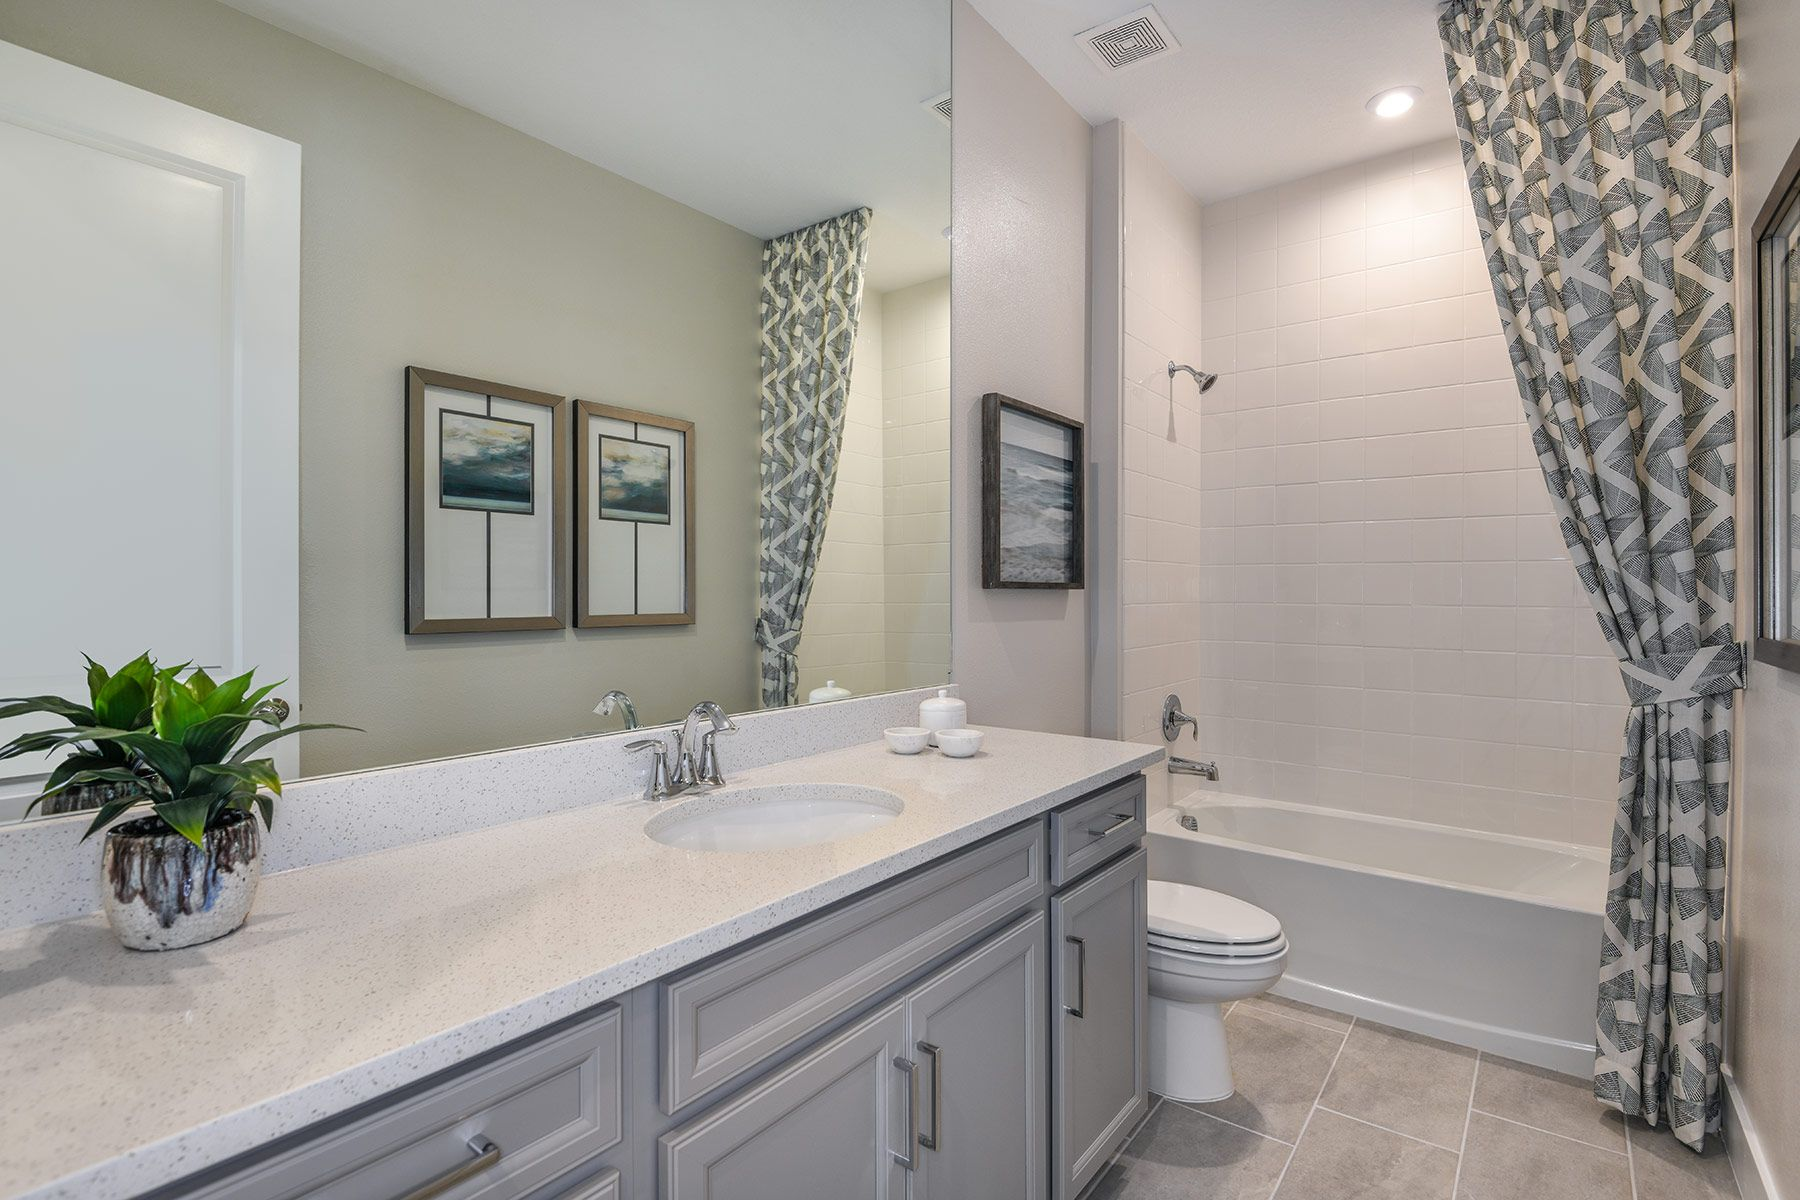 Bathroom featured in the Dominica II By Mattamy Homes in Sarasota-Bradenton, FL